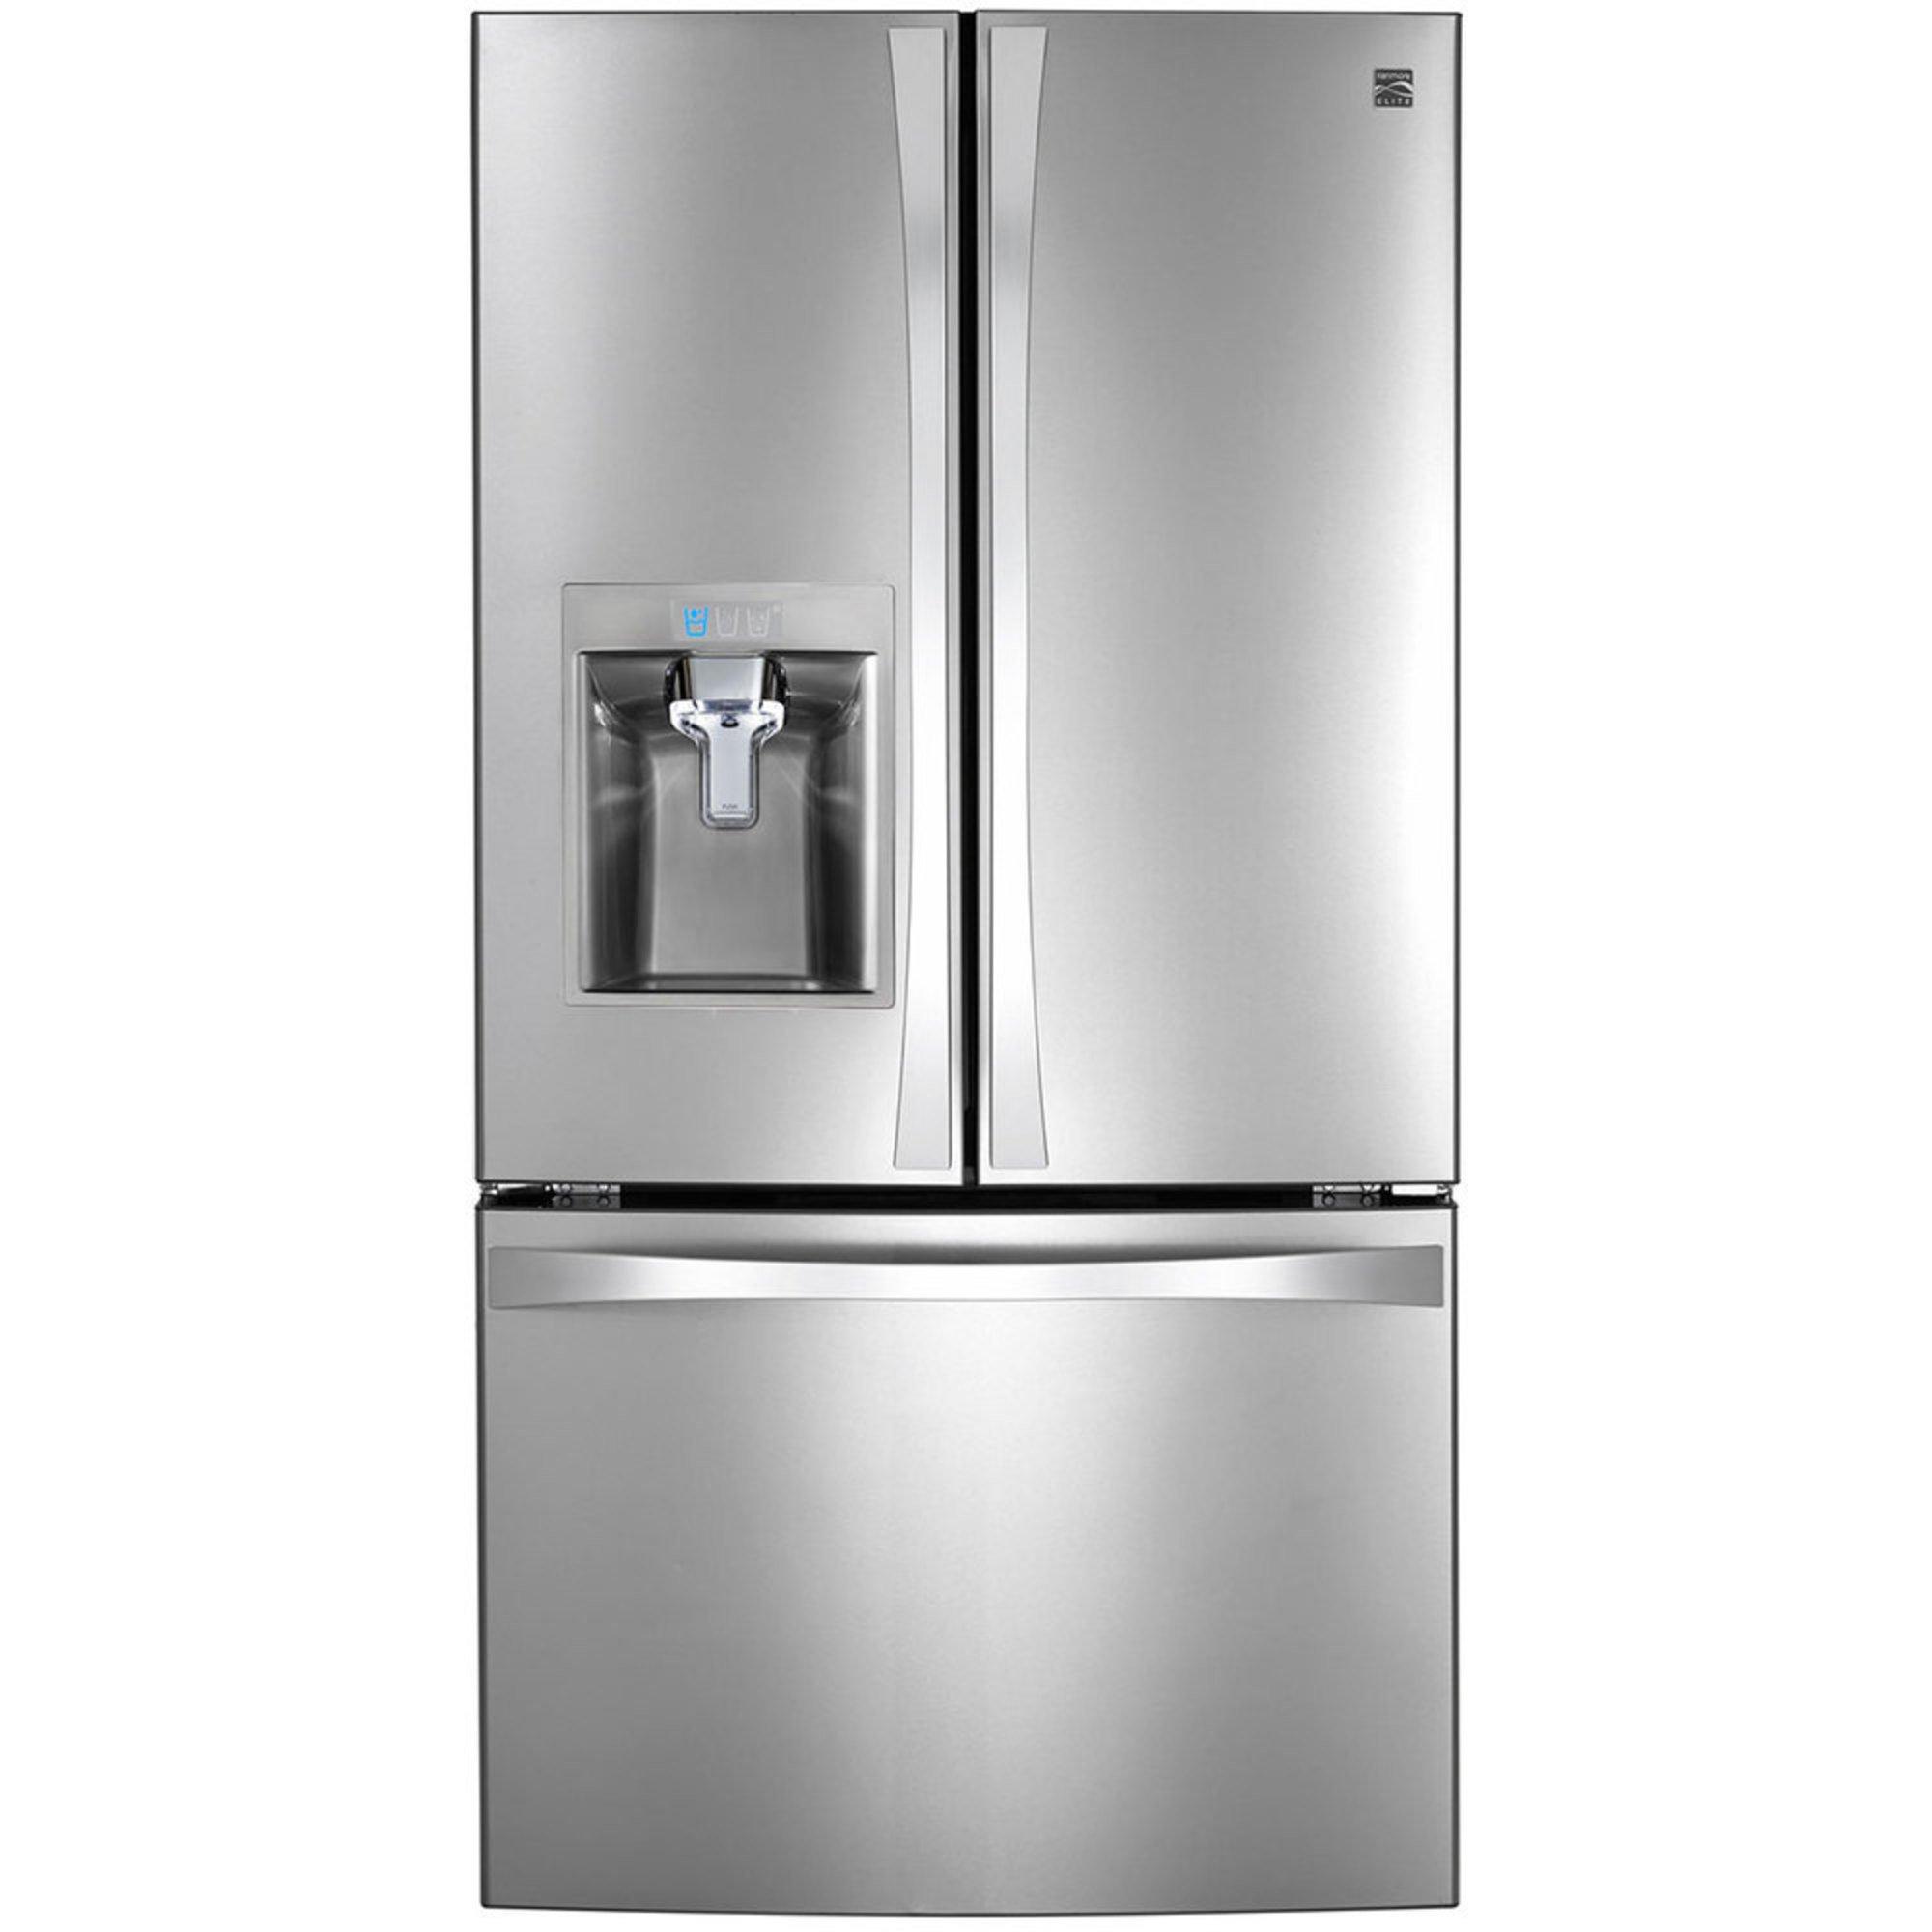 Kitchenaid 72 Counter Depth Refrigerator